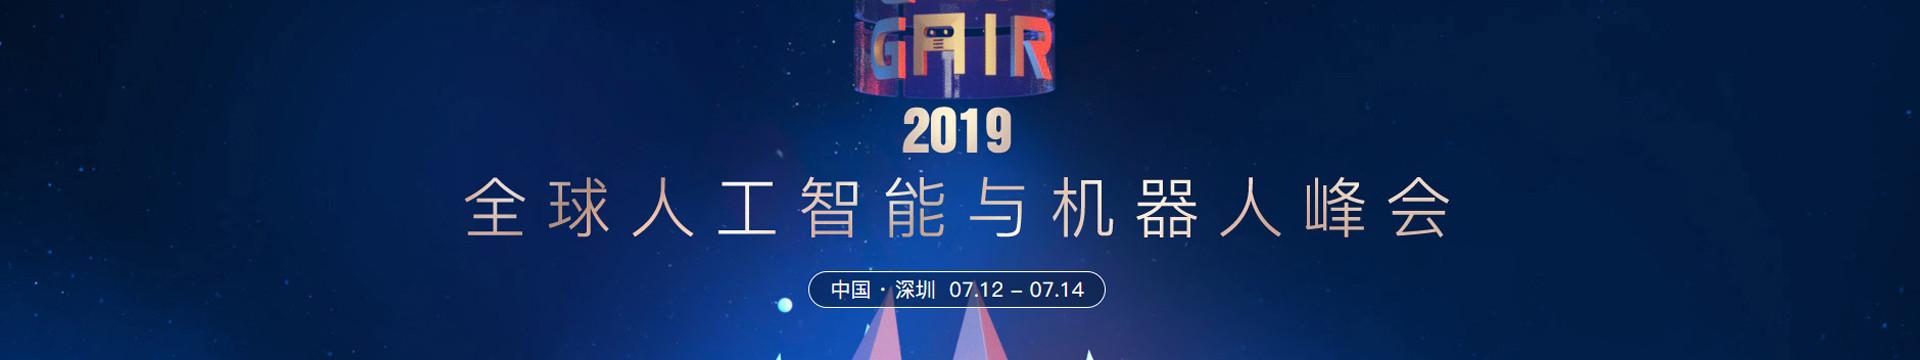 2019CCF-GAIR全球人工智能与机器人峰会(深圳)